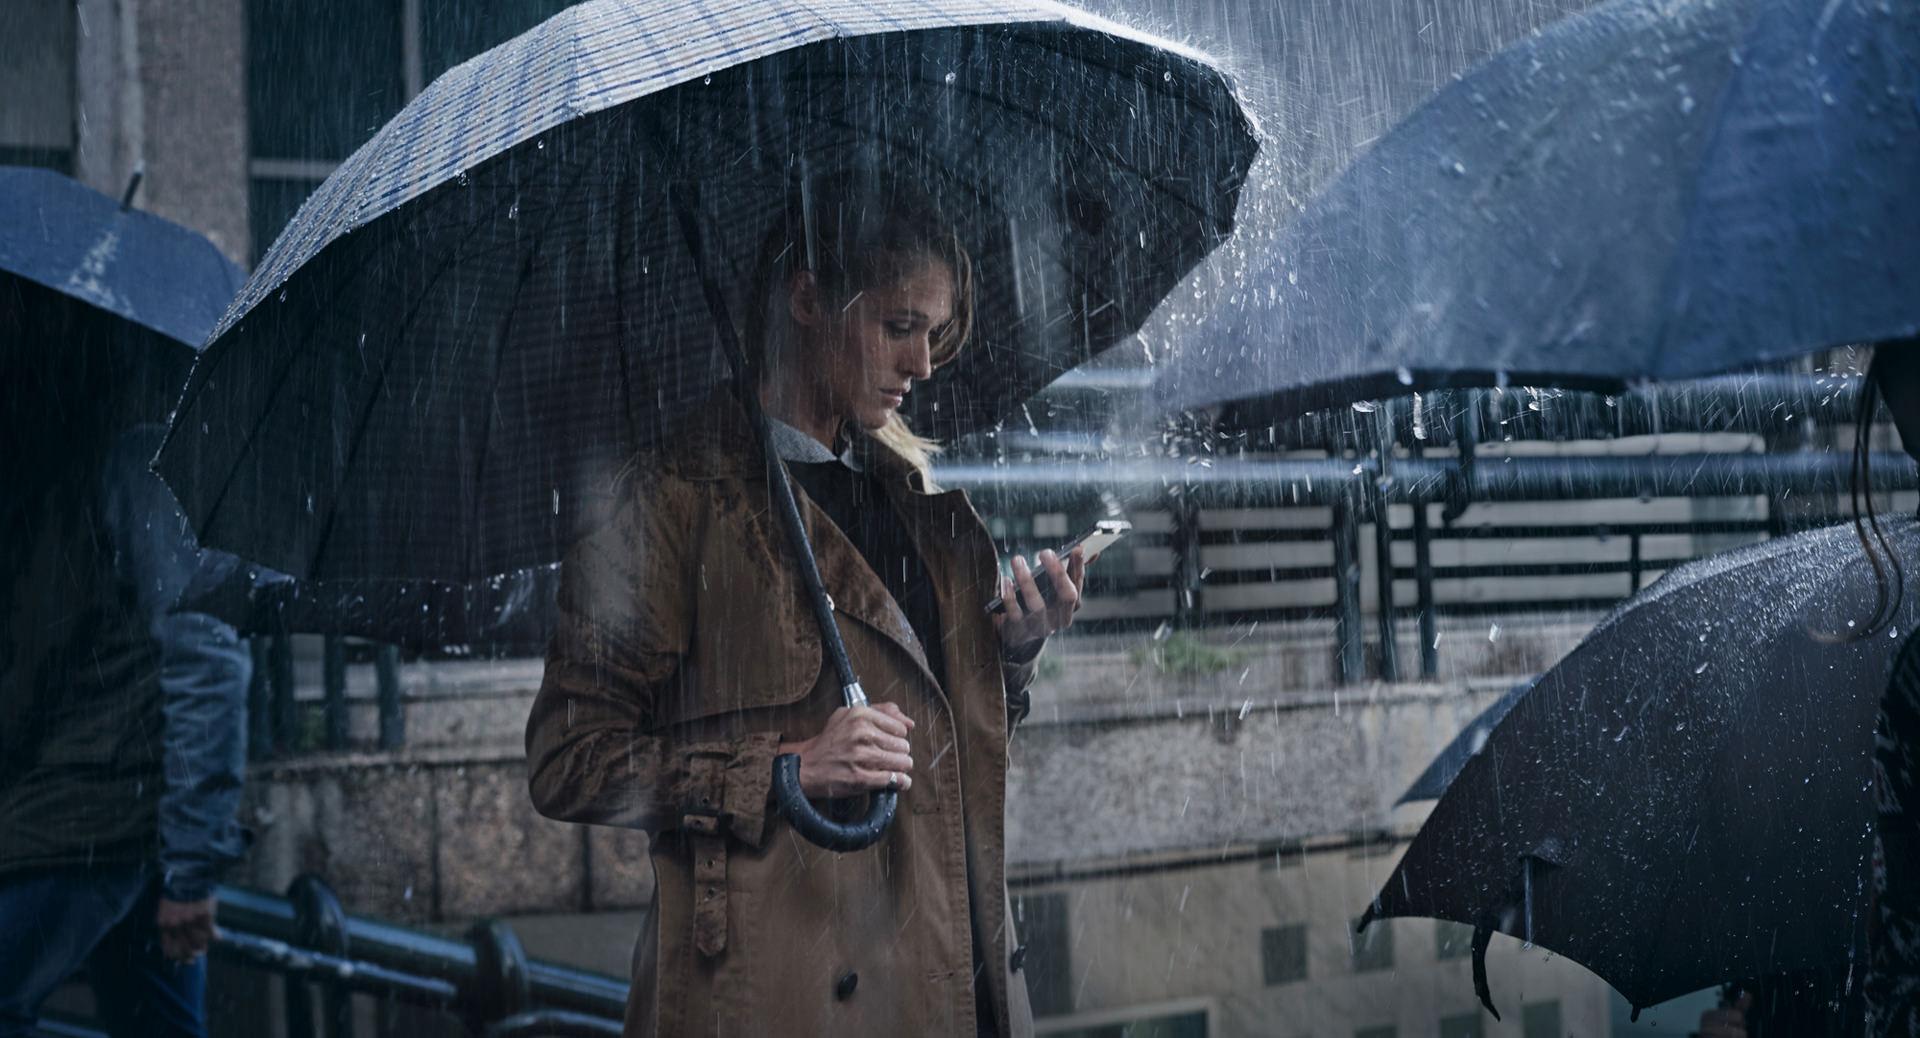 Audi Rainmaker, rain, newspaper, urban, Audi Magazin, Loved, Anke Luckmann, www.ankeluckmann.com, kai tietz, lifestyle